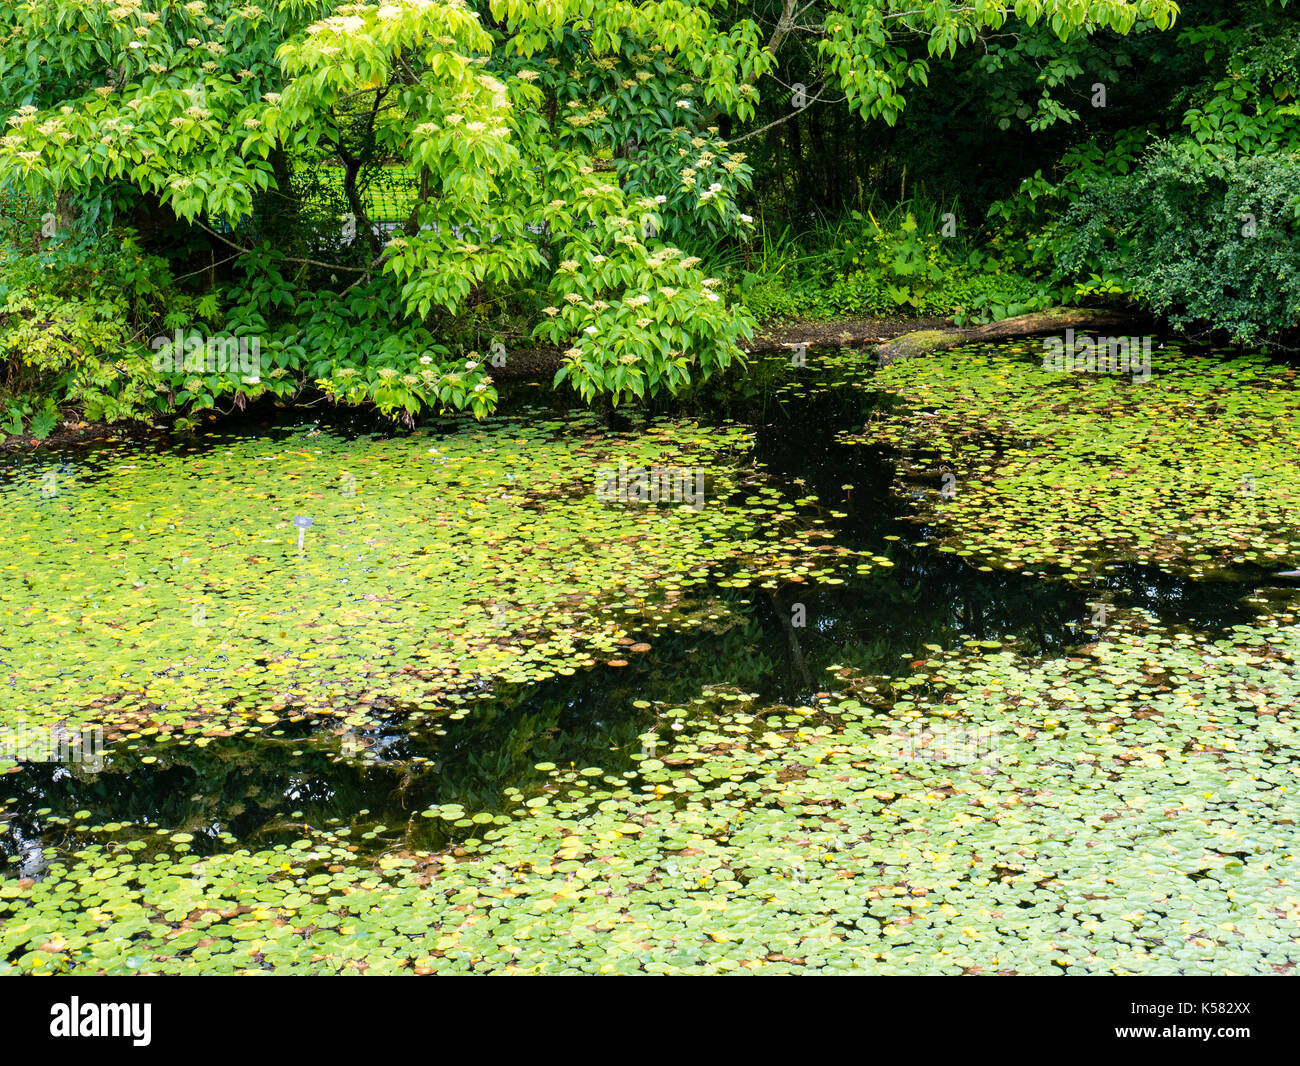 Water Lilly's, Chinese Hillside, Royal Botanic Garden Edinburgh, Edinburgh, Scotland - Stock Image